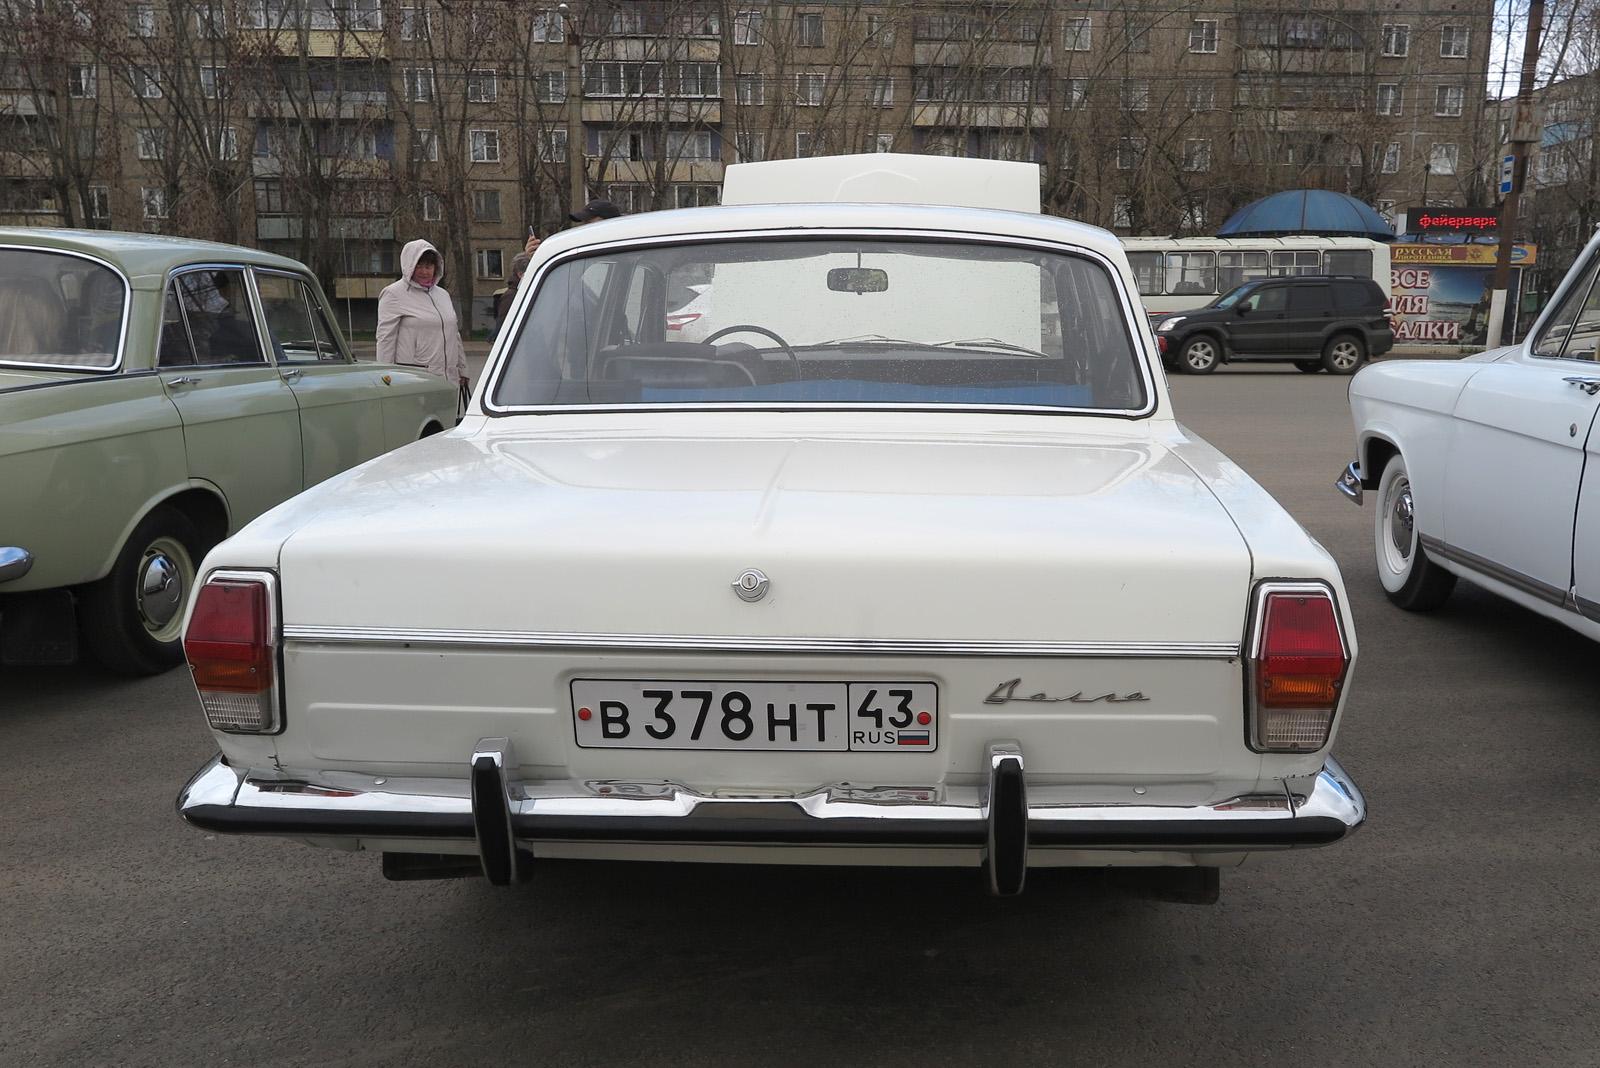 2059 ГАЗ-24 №в378нт.JPG